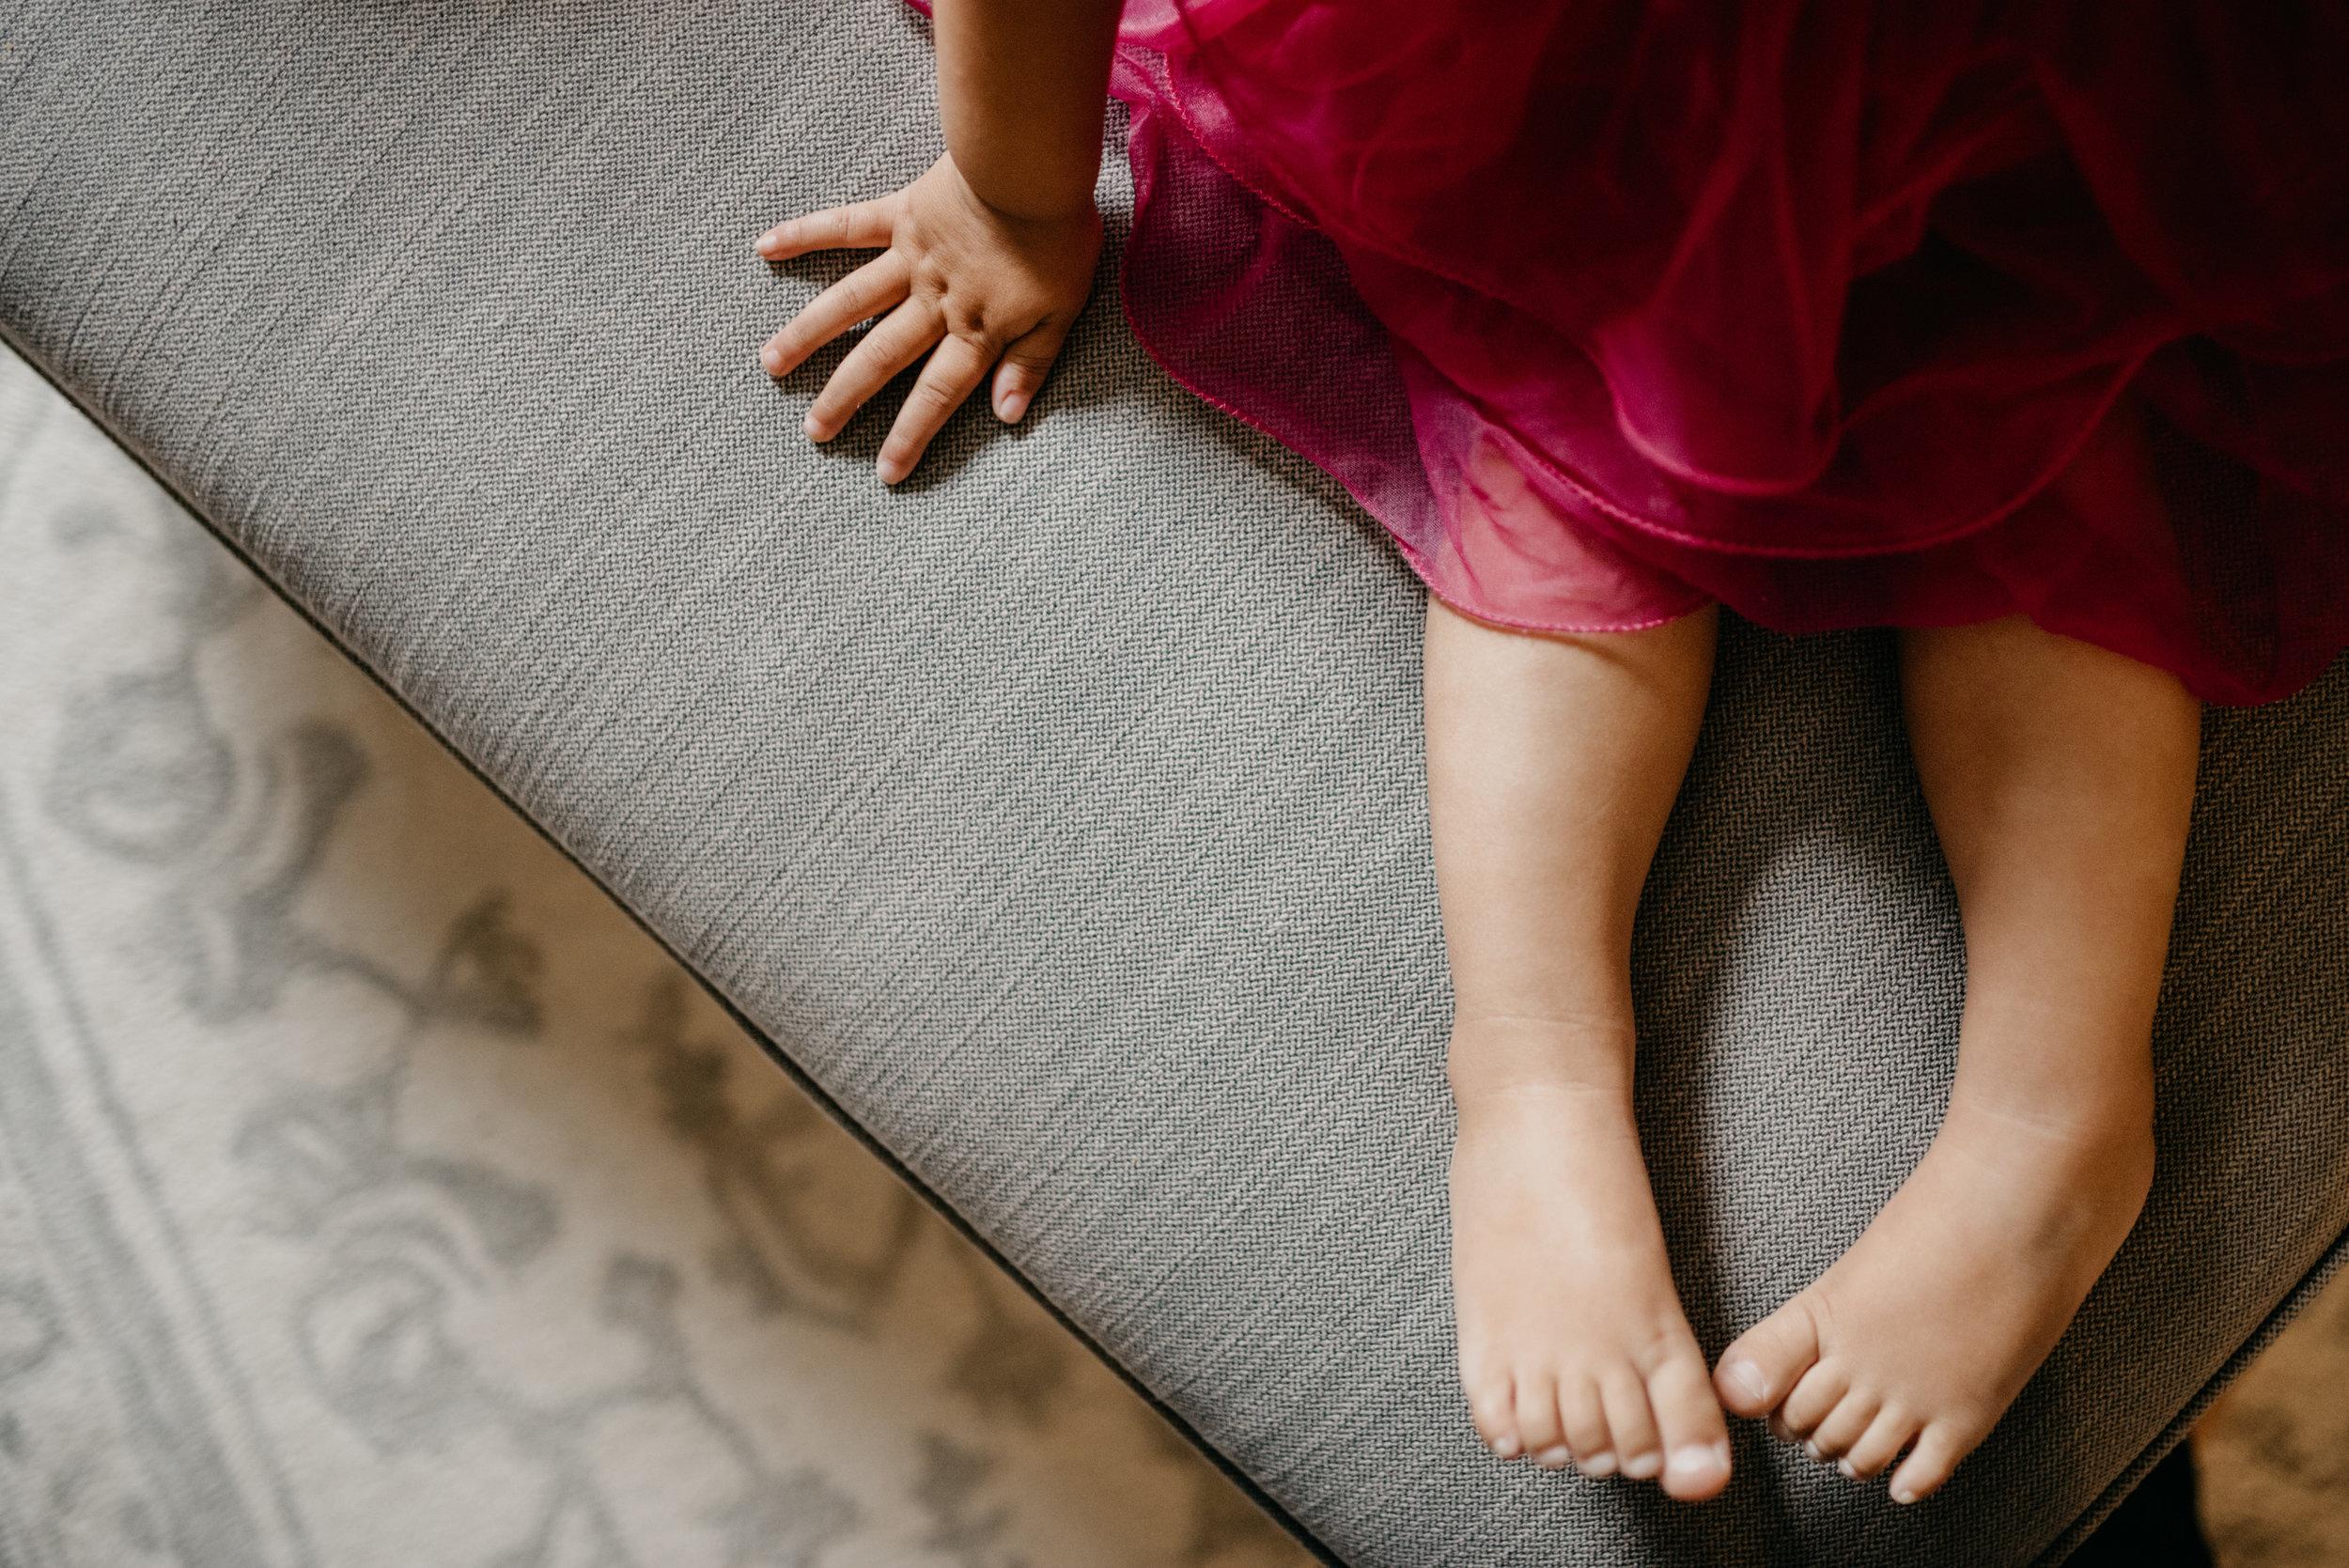 Ehrman-Massachusetts-In Home Lifestyle Maternity Session-Documentary Family Photographer-13.jpg